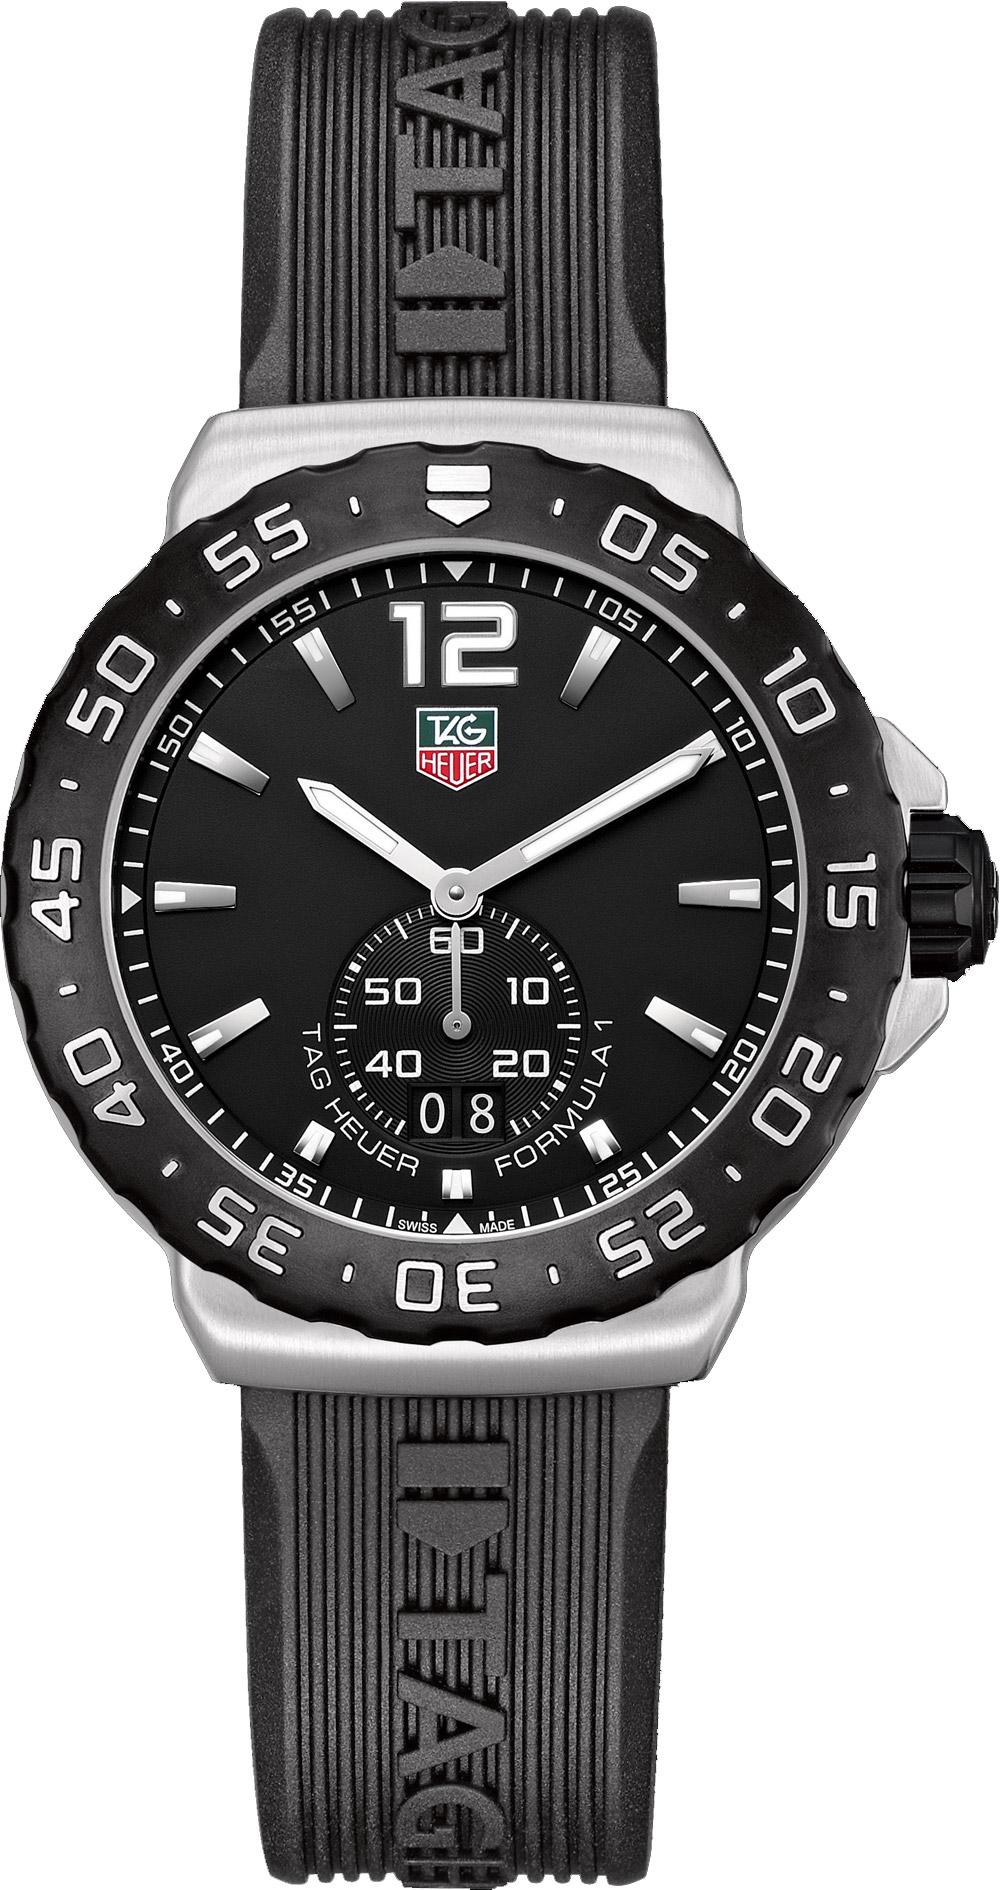 tag heuer formula 1 grande date 42mm men s watch model wau1110 ft6024 tag heuer formula 1 grande date 42mm men s watch